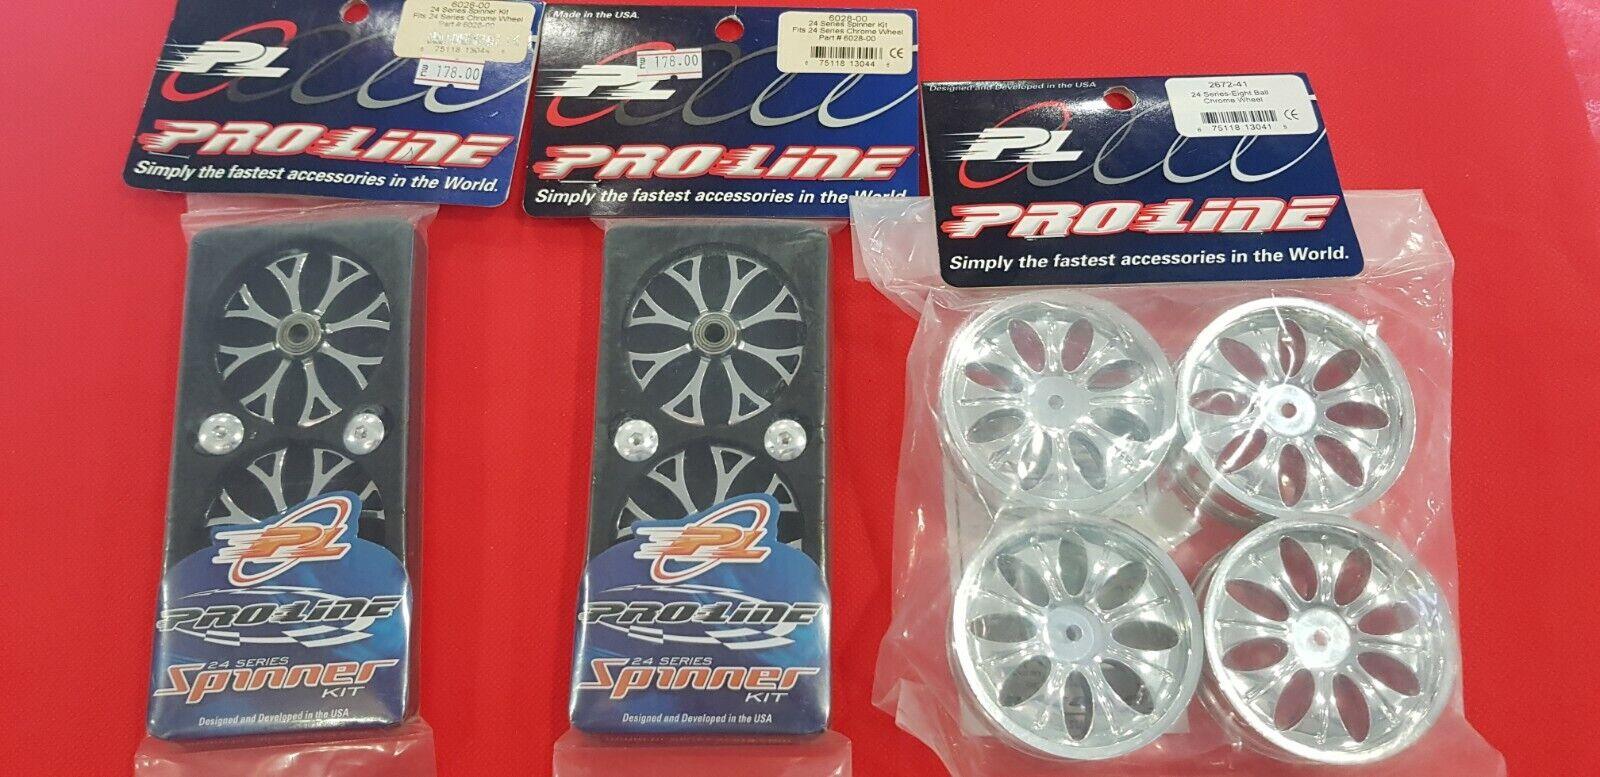 prezzi eccellenti Pro-Line 2 pair 24 TC Series Spinner 6028-00 6028-00 6028-00 + 24 TC ruedas 2672-41  in vendita